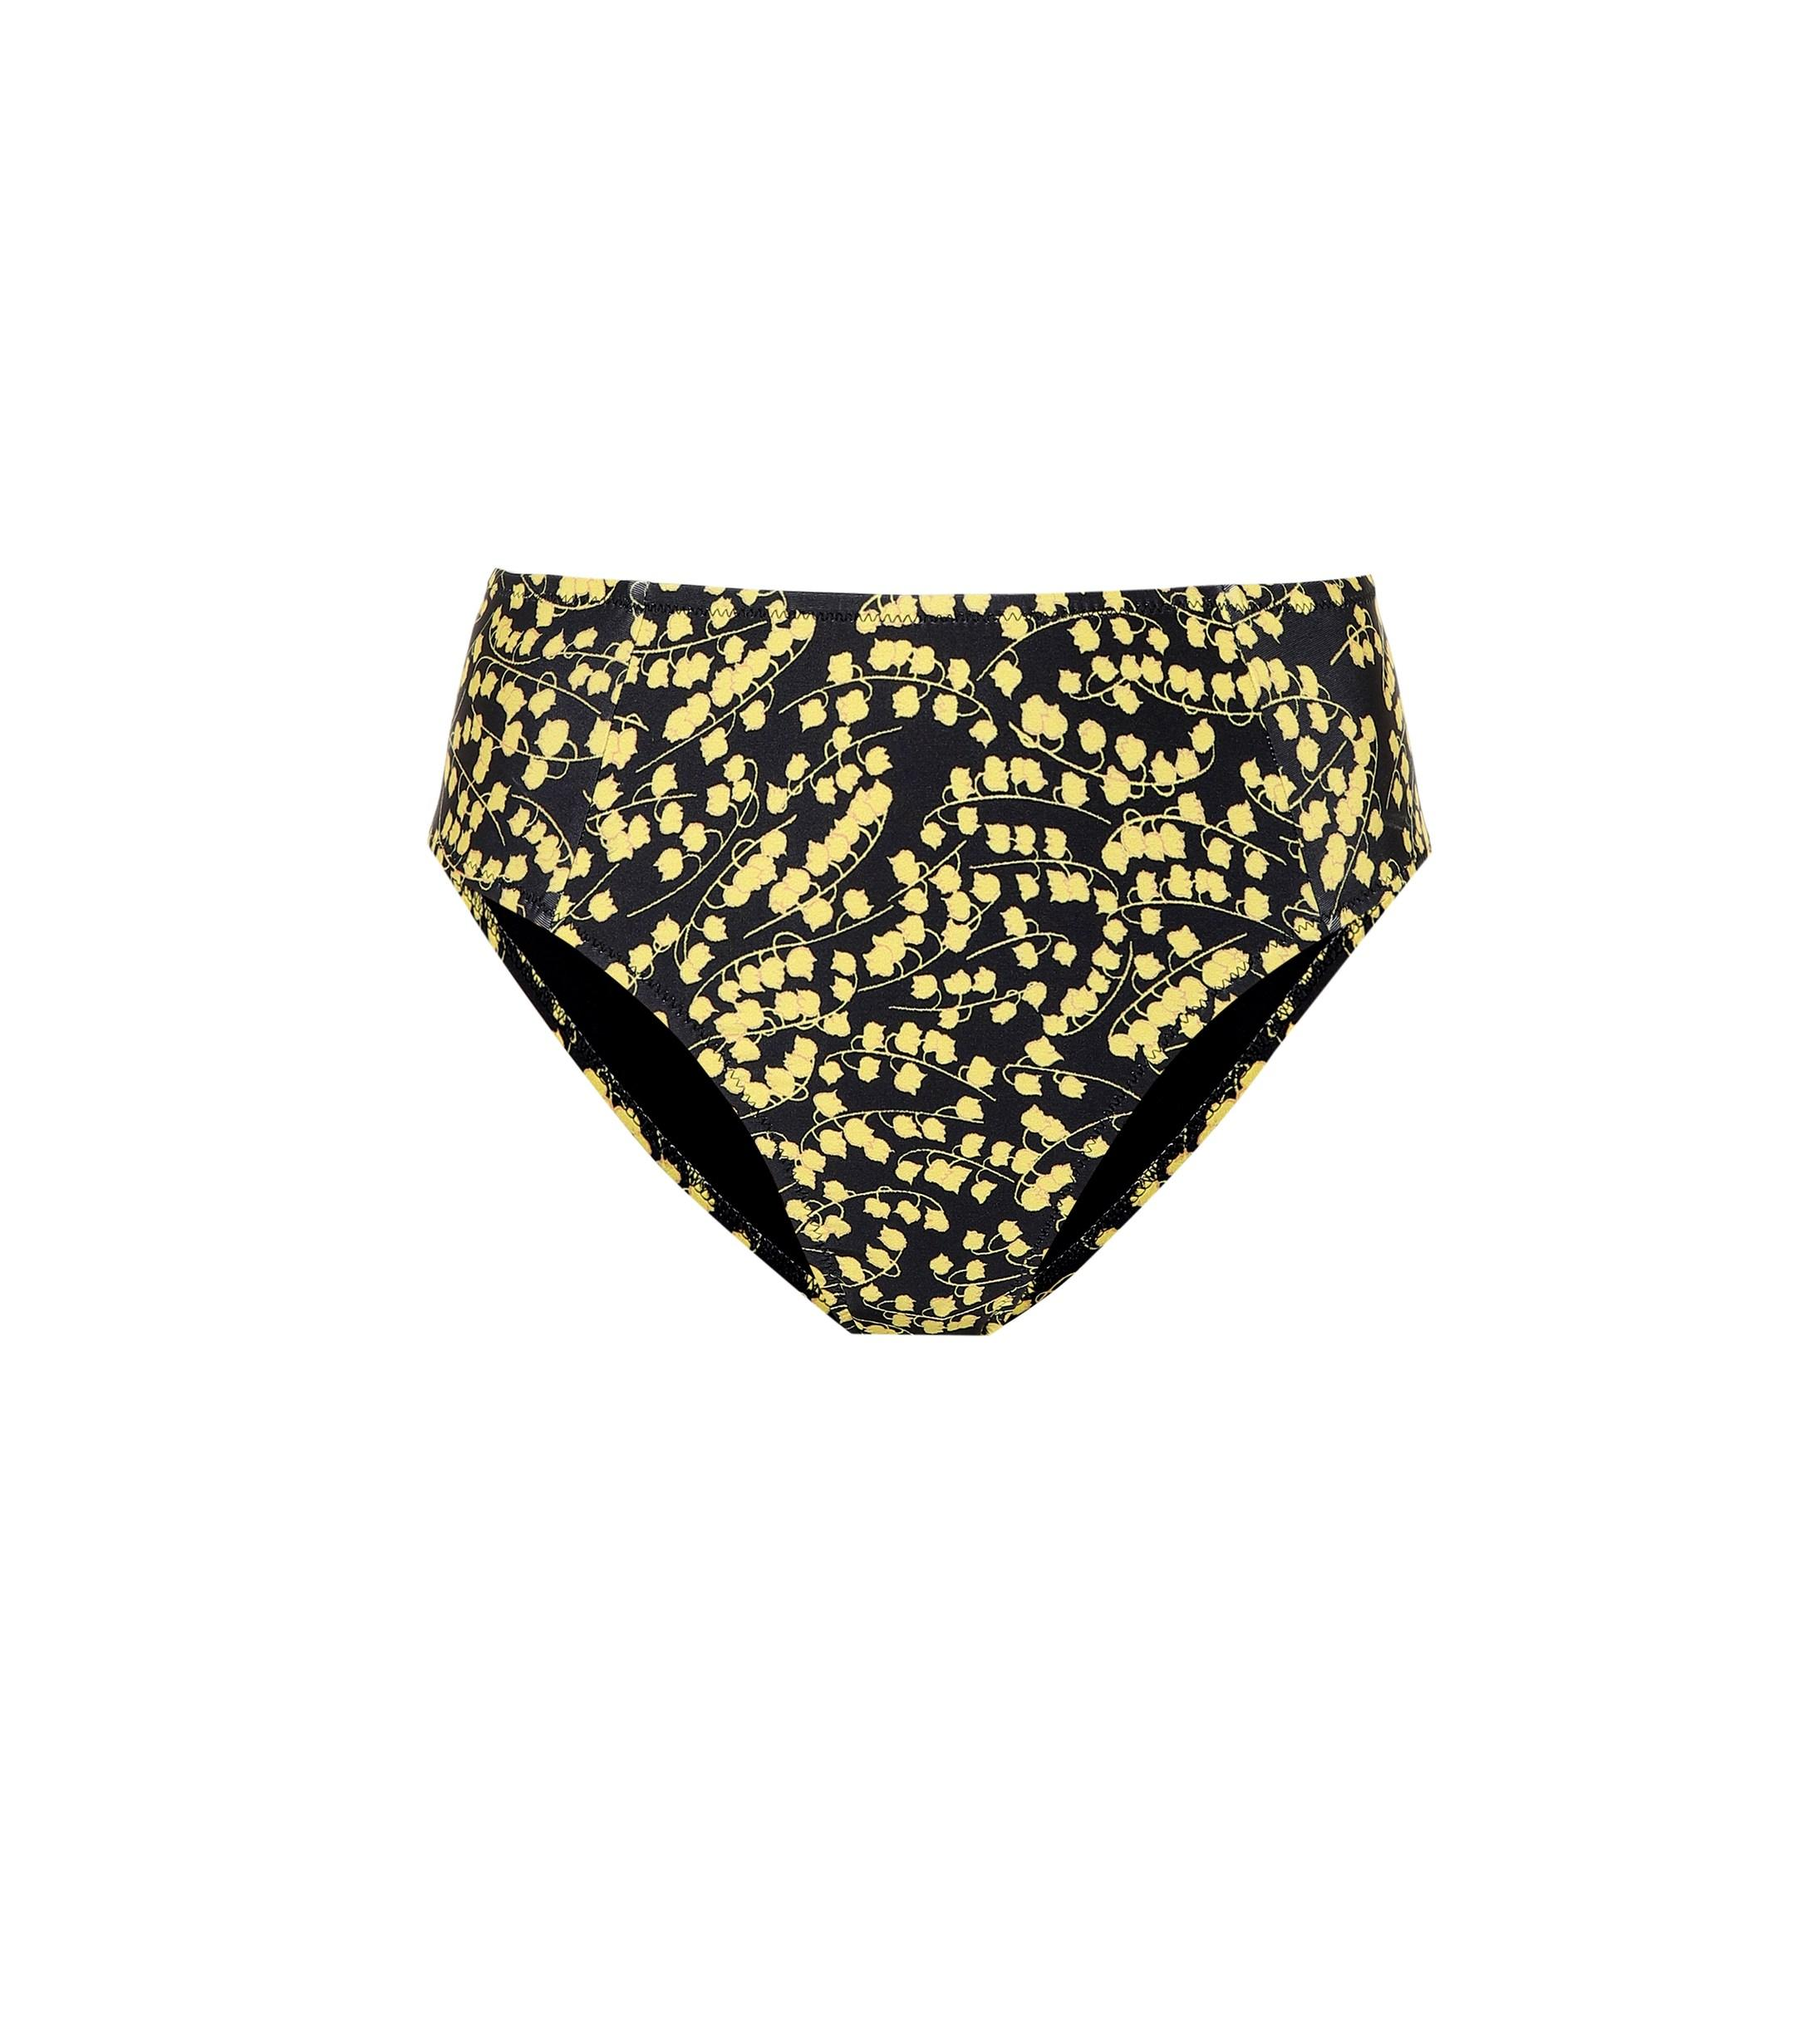 1b9e25b95c4 Lyst - Ganni Printed Bikini Bottoms in Black